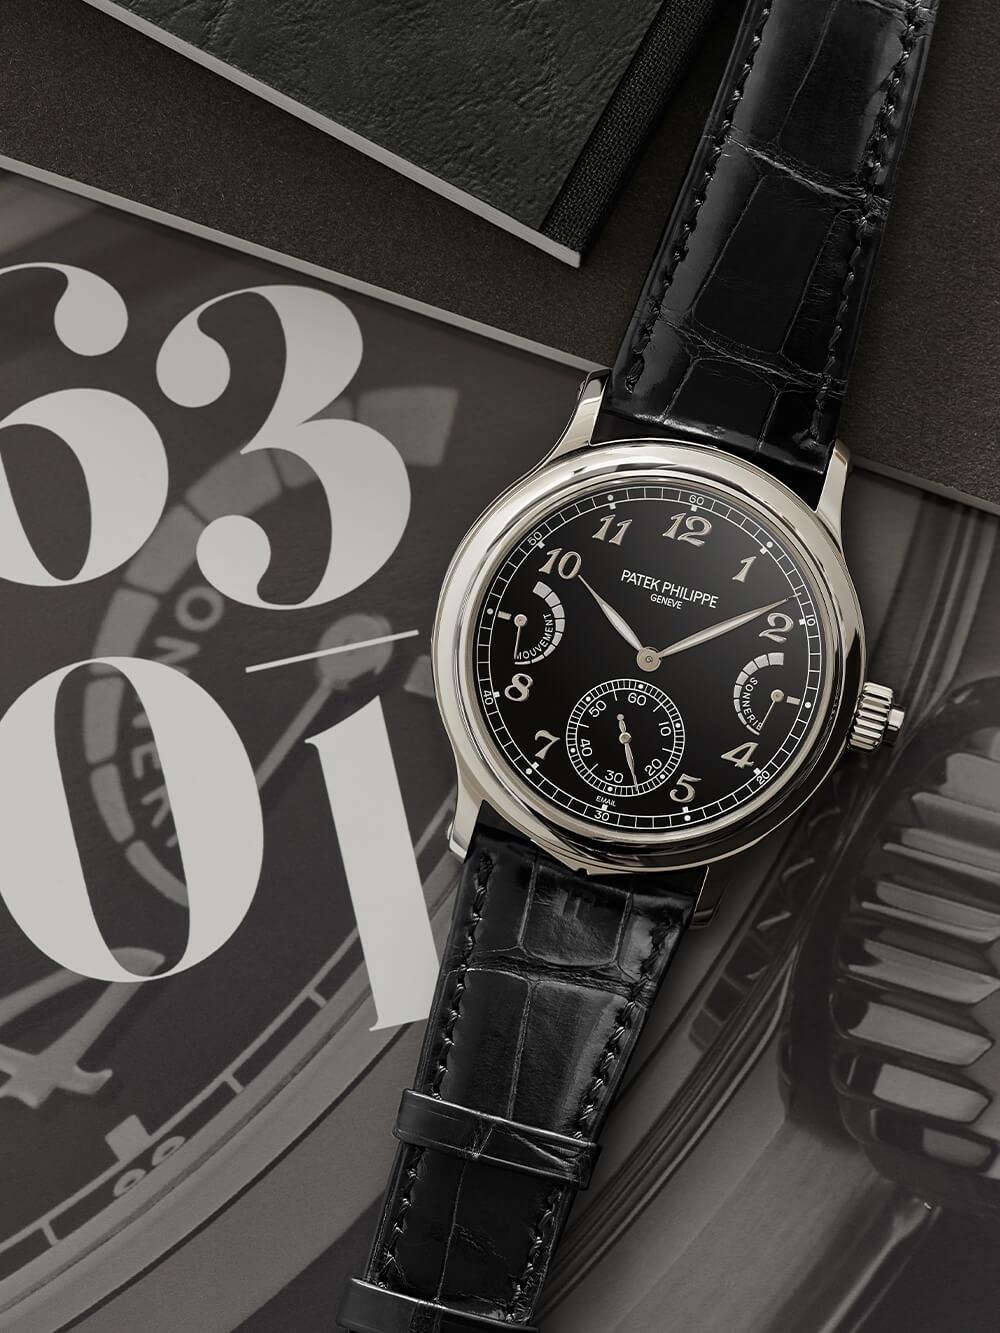 Đồng hồ Patek PhilippeGrand Sonnerie ref. 6301